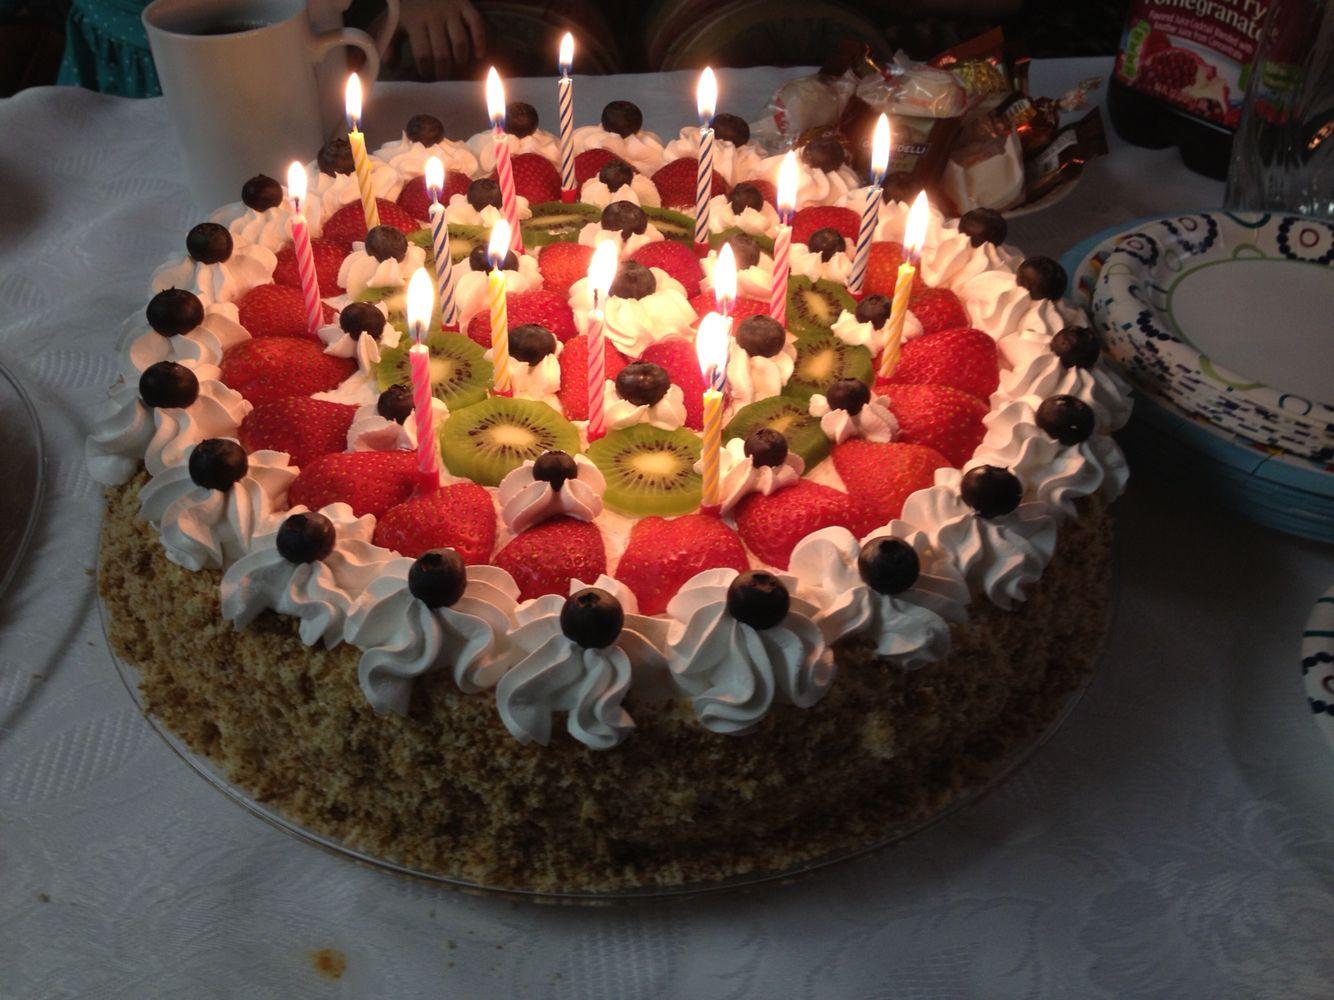 Very Tasty Birthday Cake My Favorite Actually Its Homemade